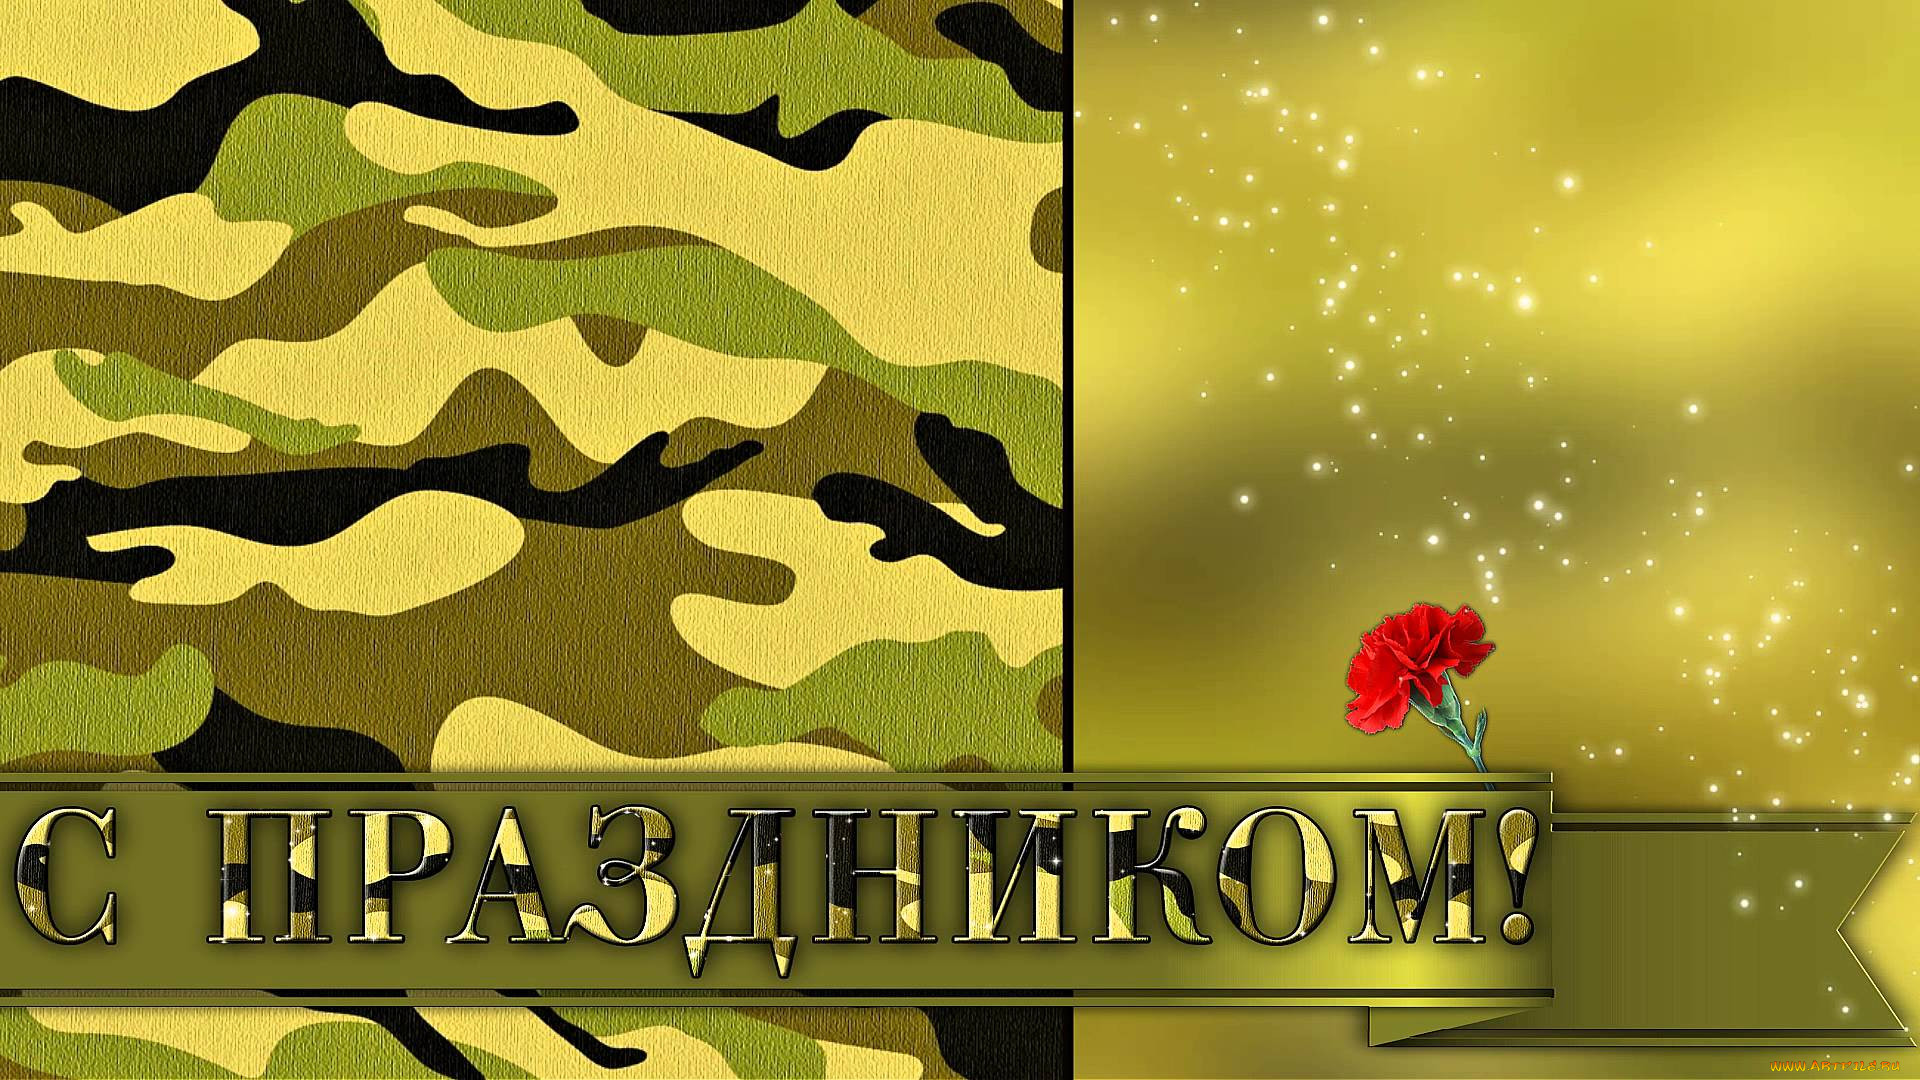 День защитника отечества картинки фон